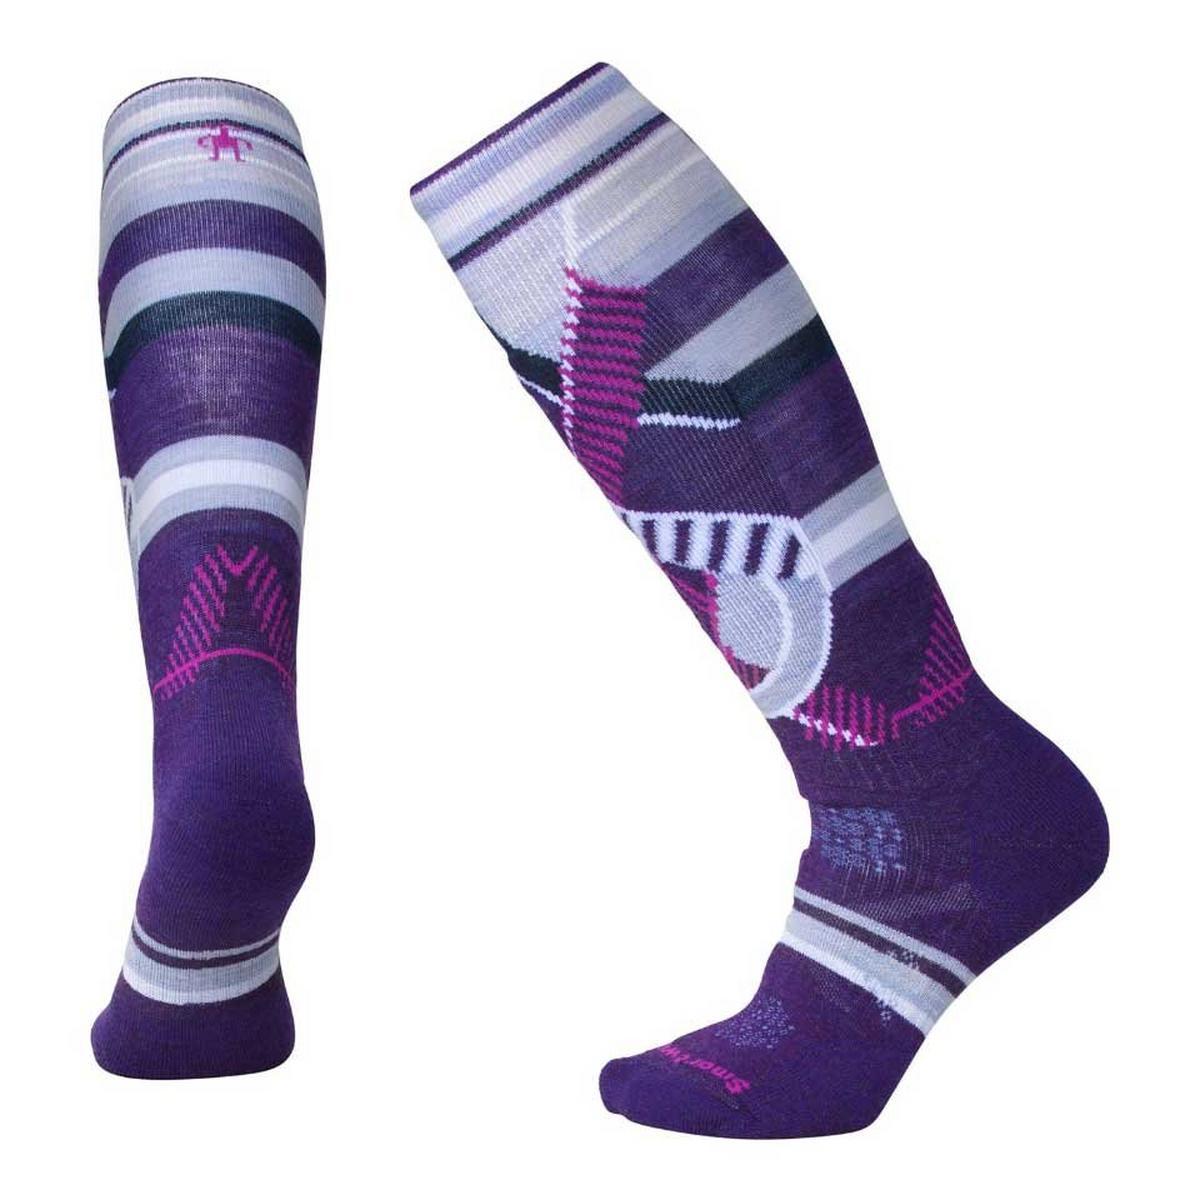 Smartwool Women's PhD® Ski Medium Pattern Sock